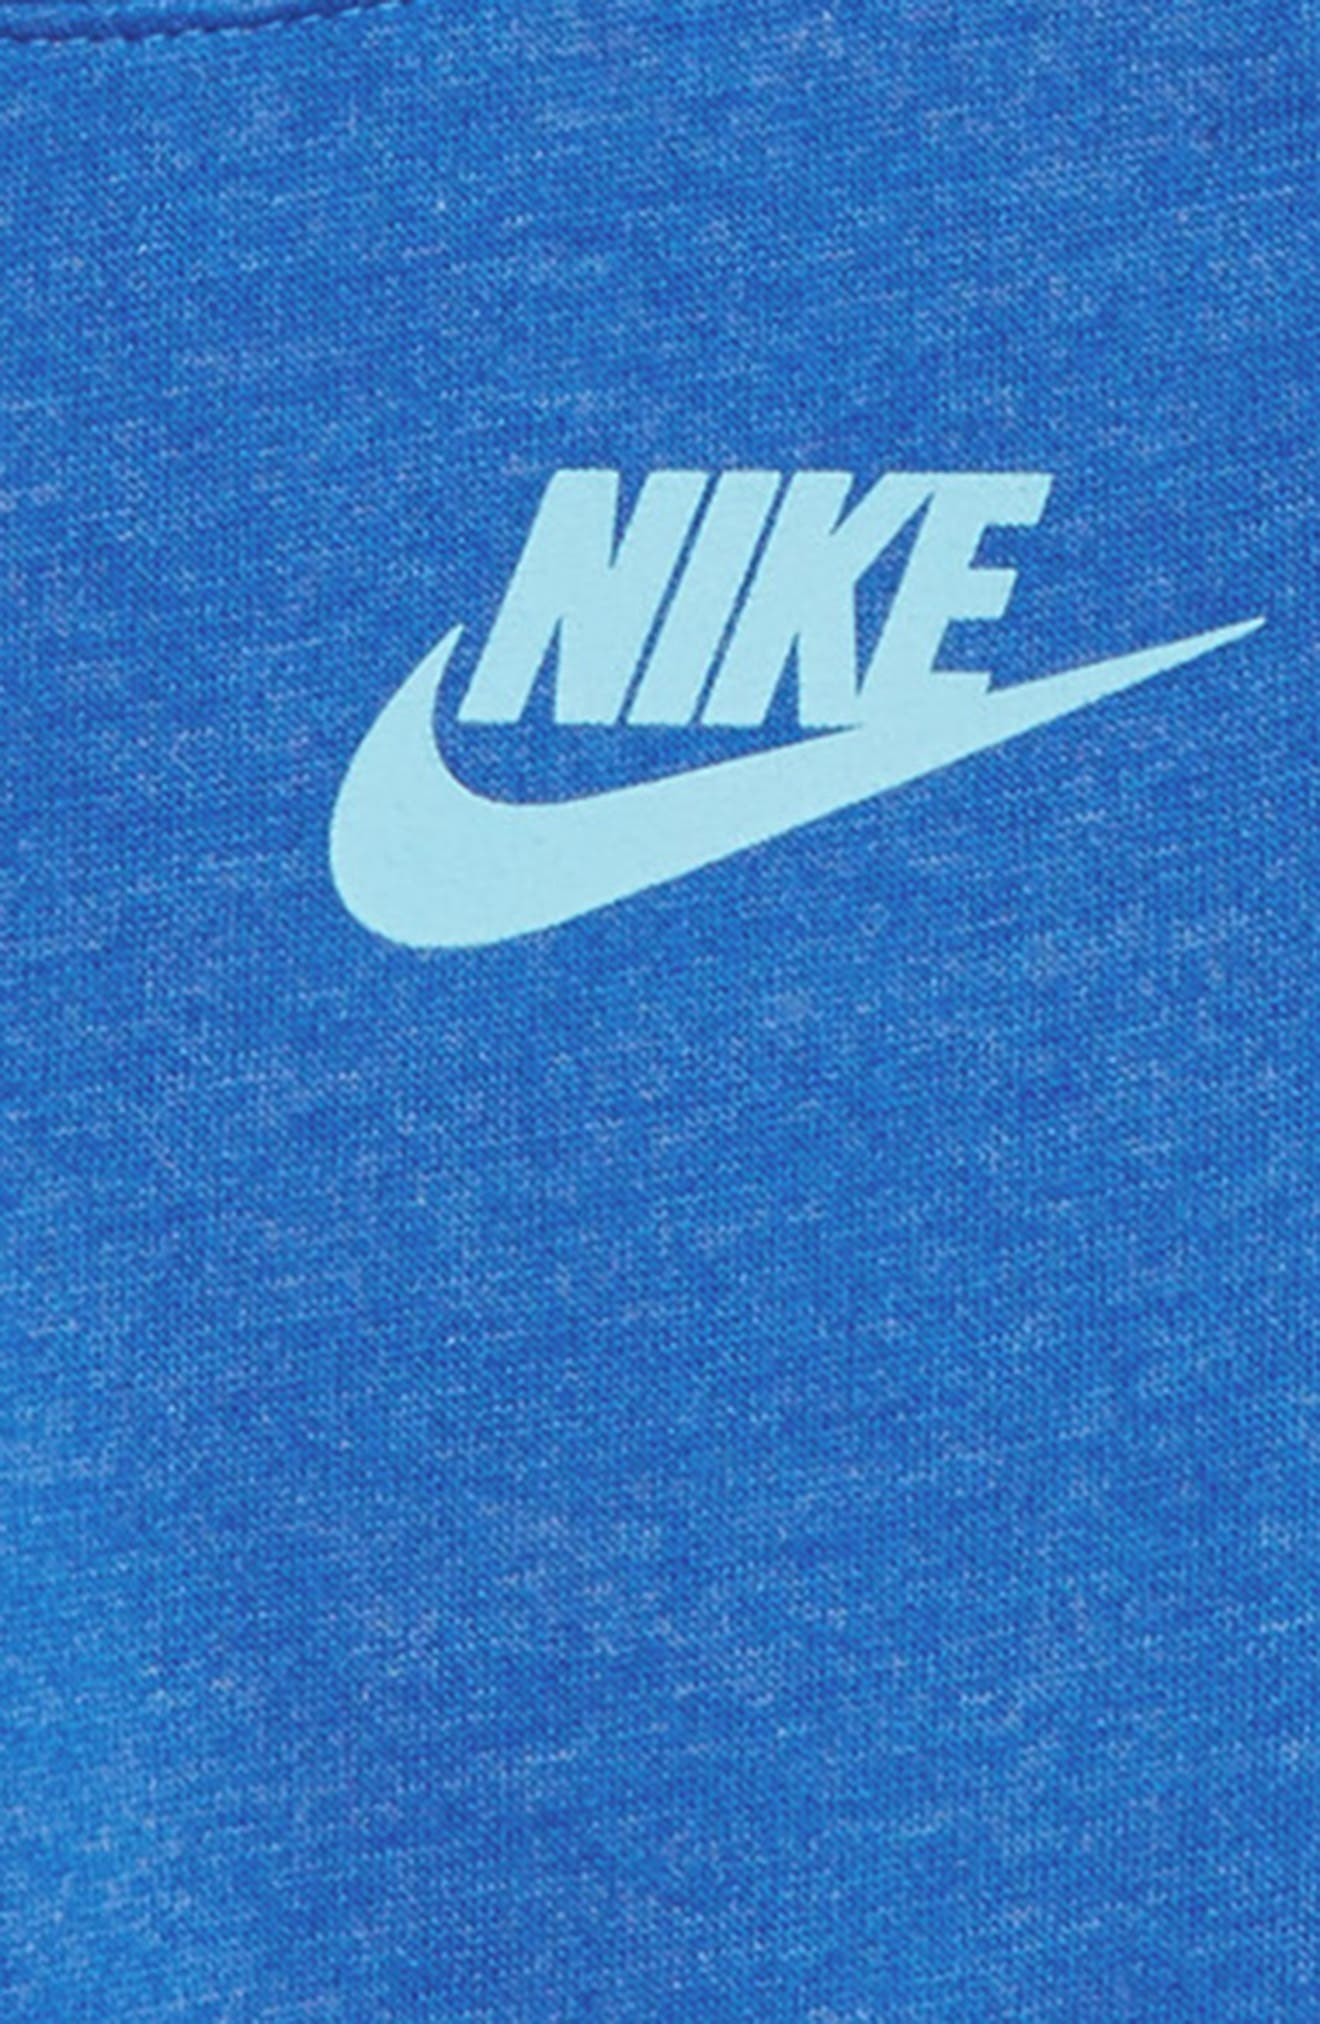 Sportswear Crewneck Pullover,                             Alternate thumbnail 2, color,                             SIGNAL BLUE/ HTR/ BLUE CHILL